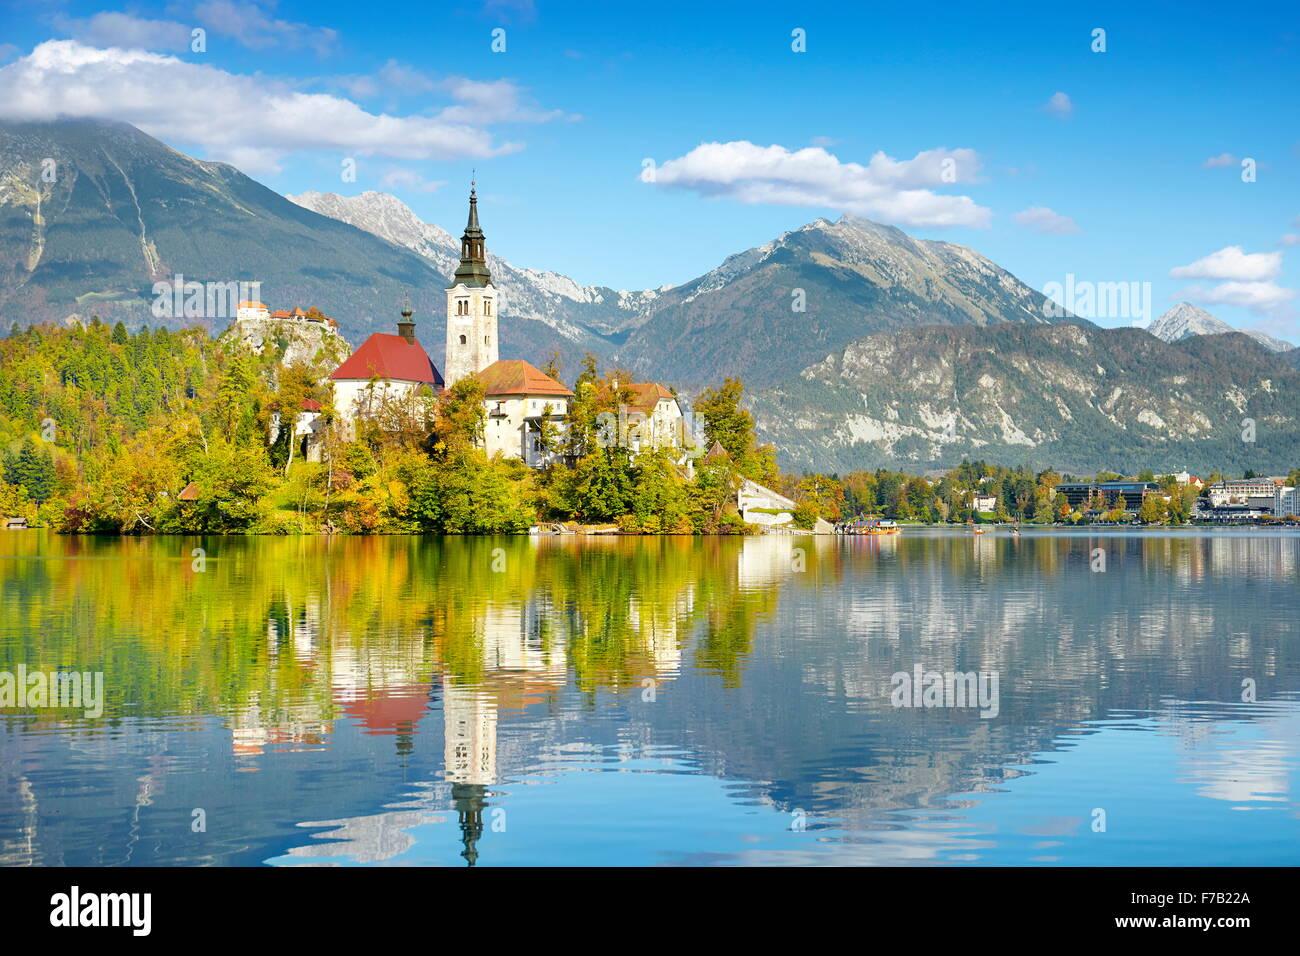 Herbst See Bled, Julische Alpen, Slowenien Stockbild